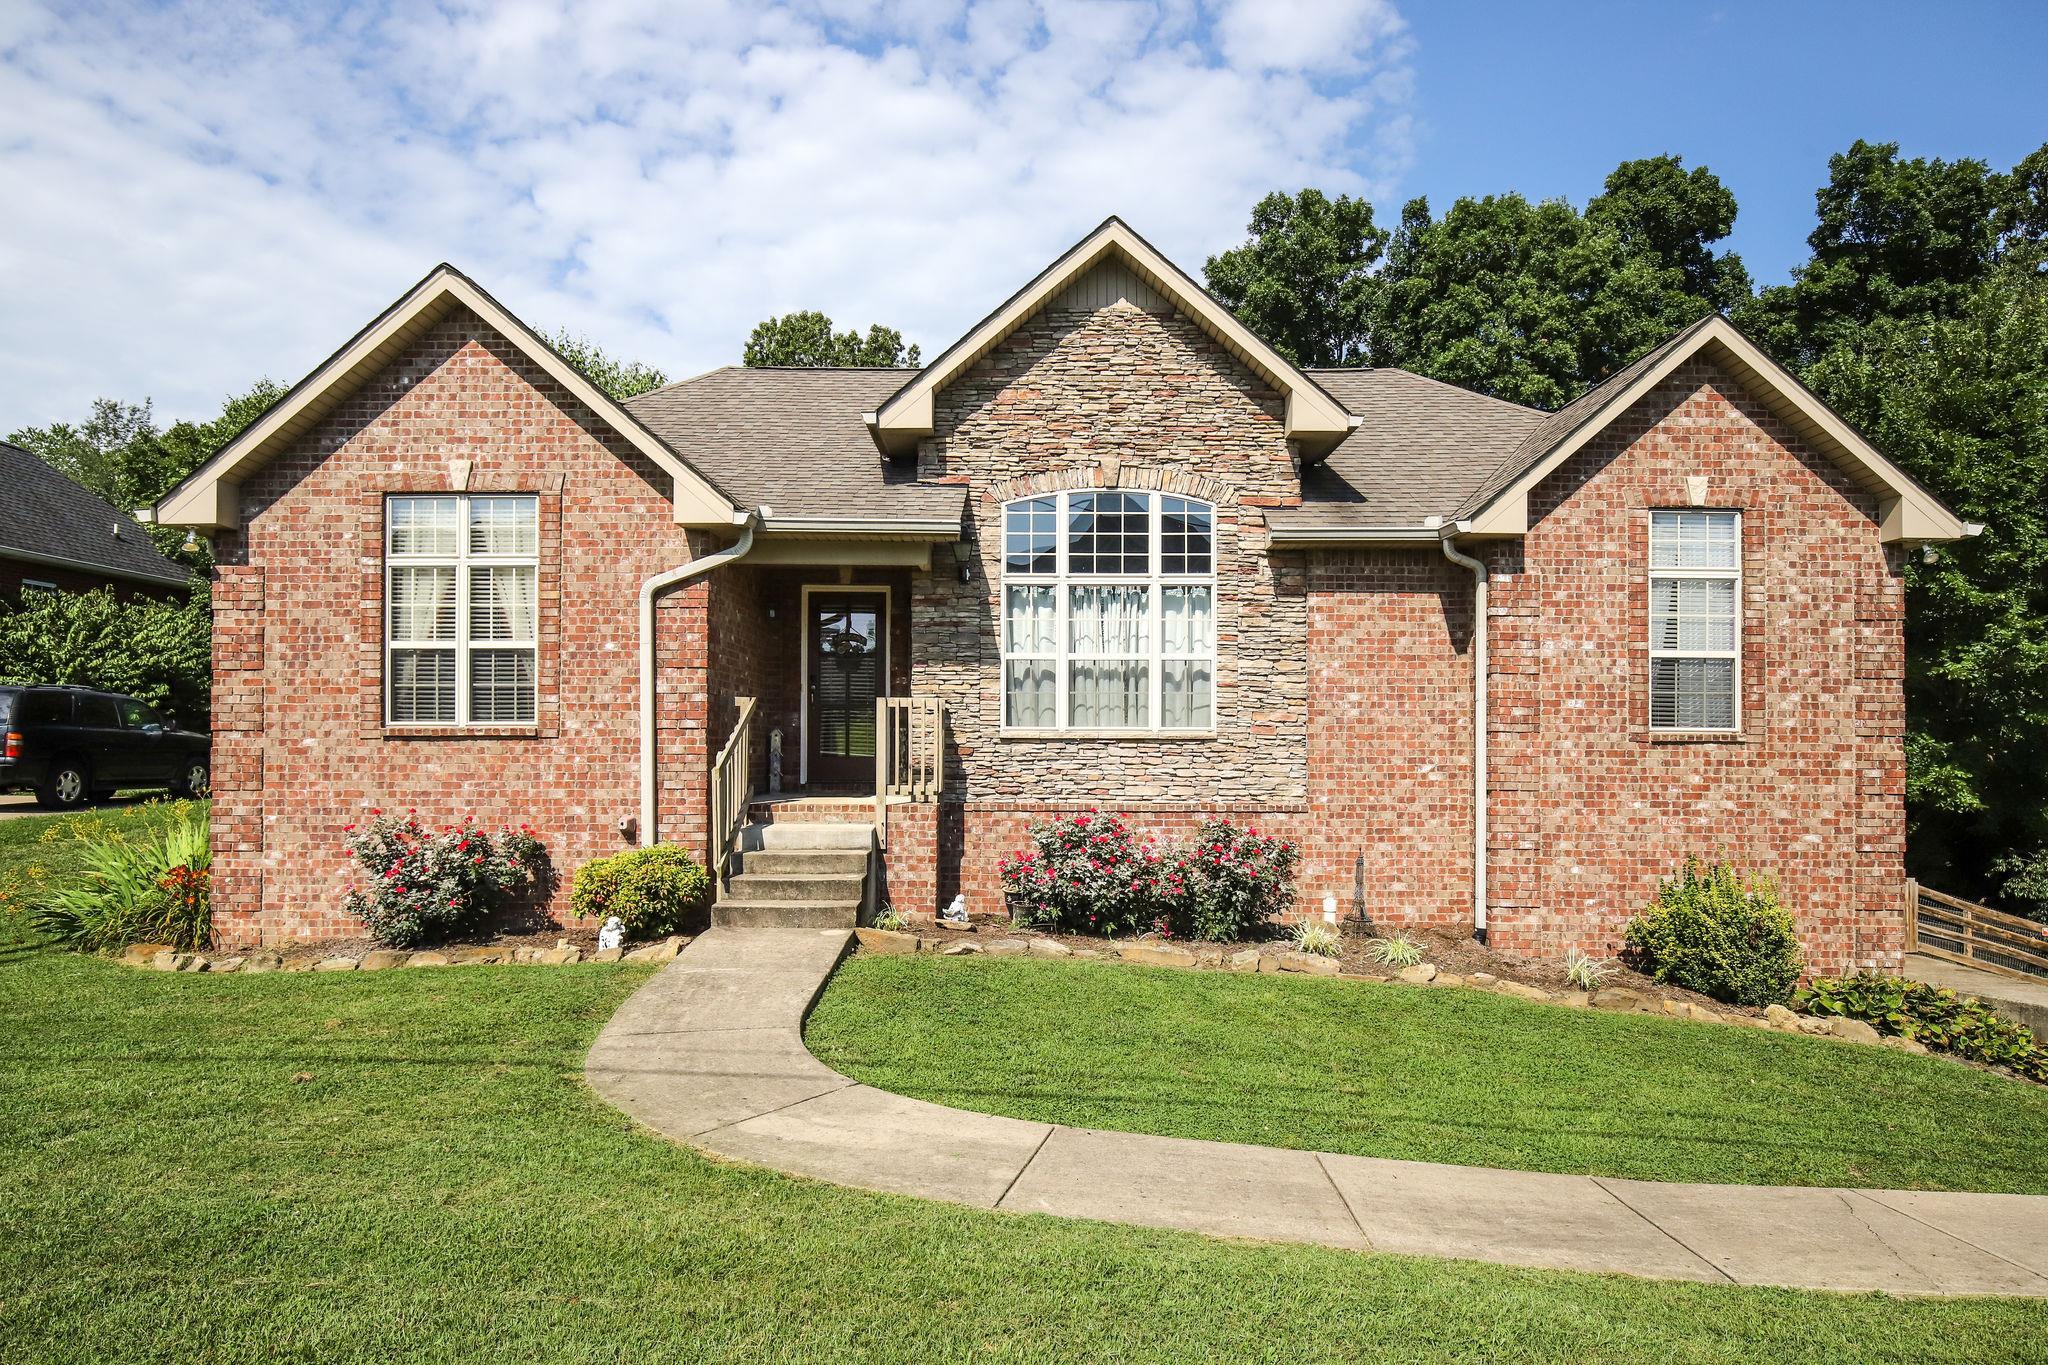 4030 Brimestone Way, Greenbrier, TN 37073 - Greenbrier, TN real estate listing